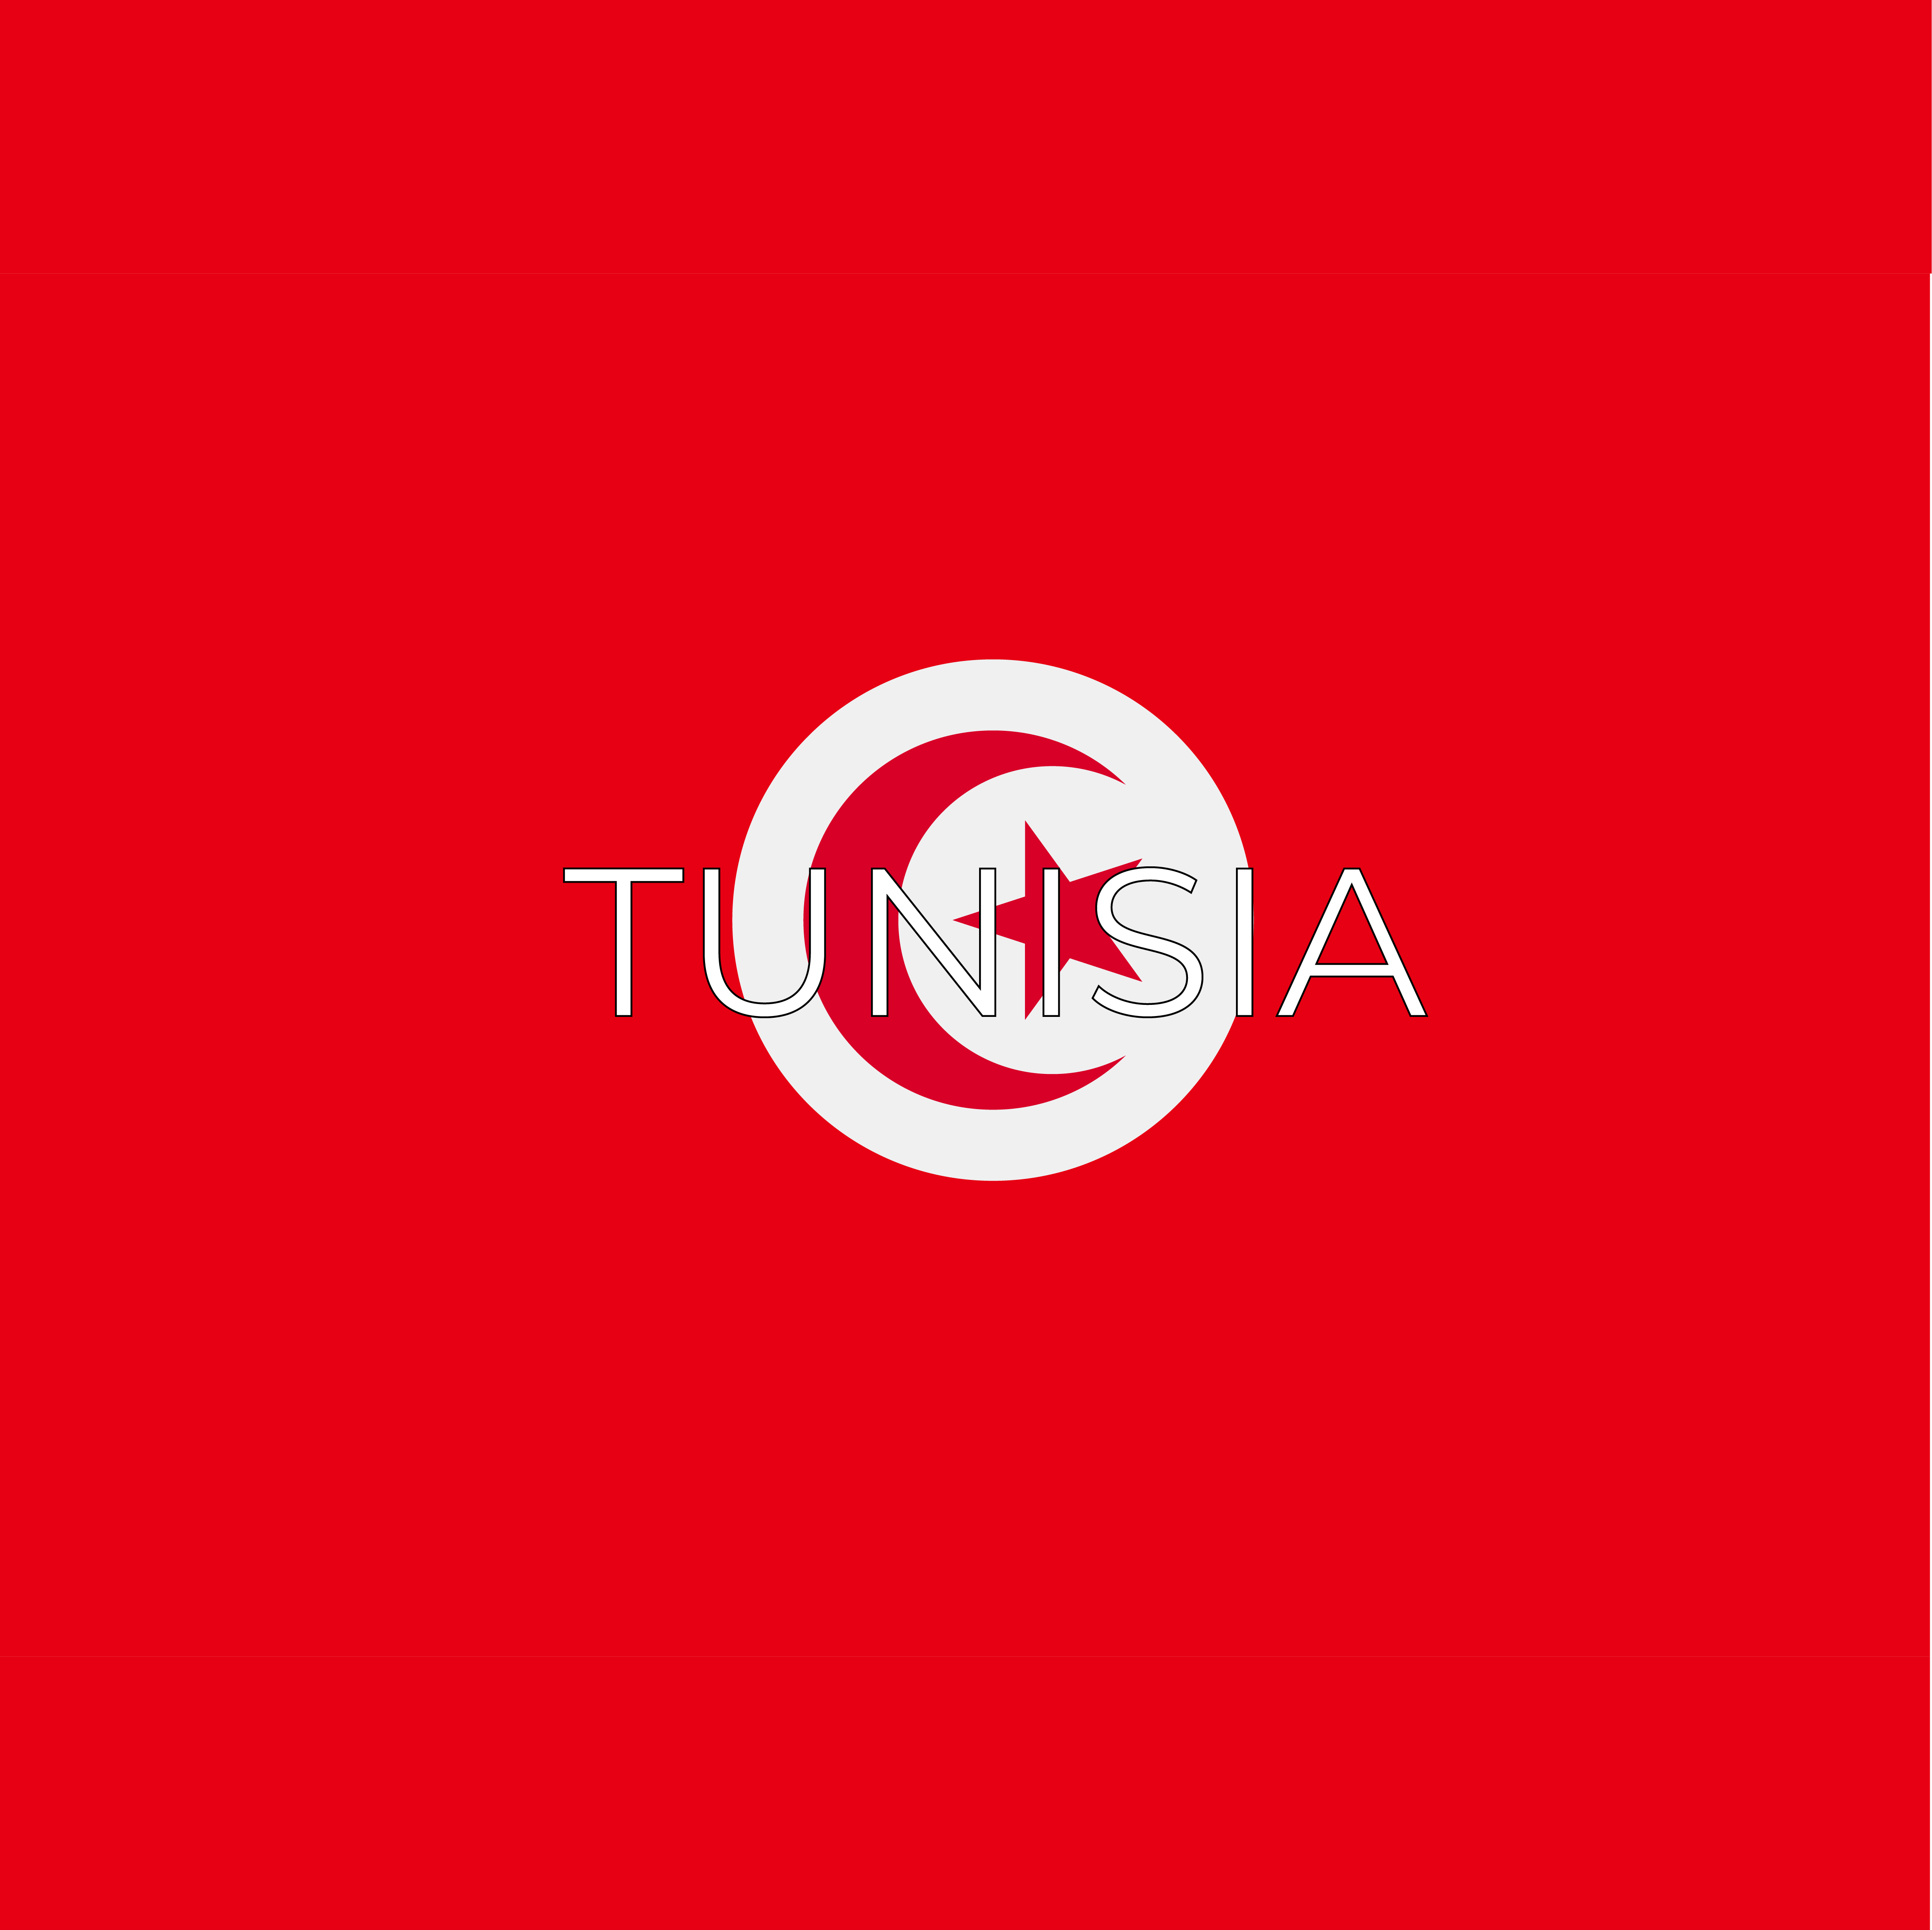 Shop By- Tunisia